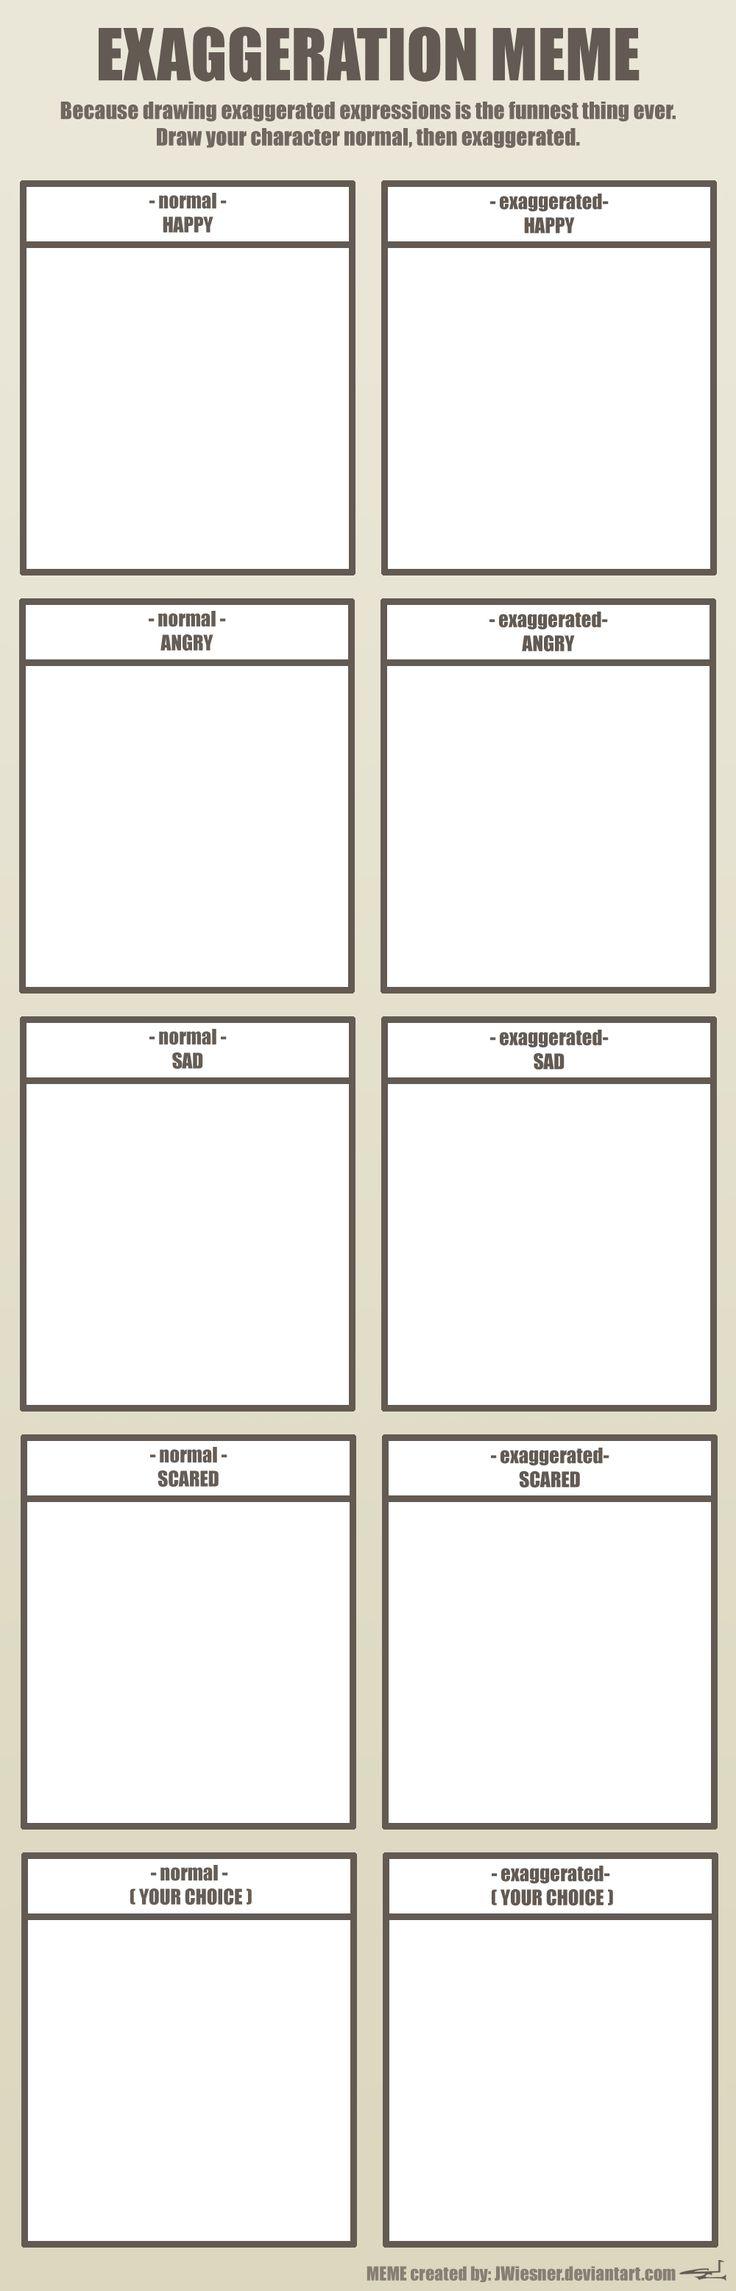 EXAGGERATION MEME (blank) by JWiesner on DeviantArt